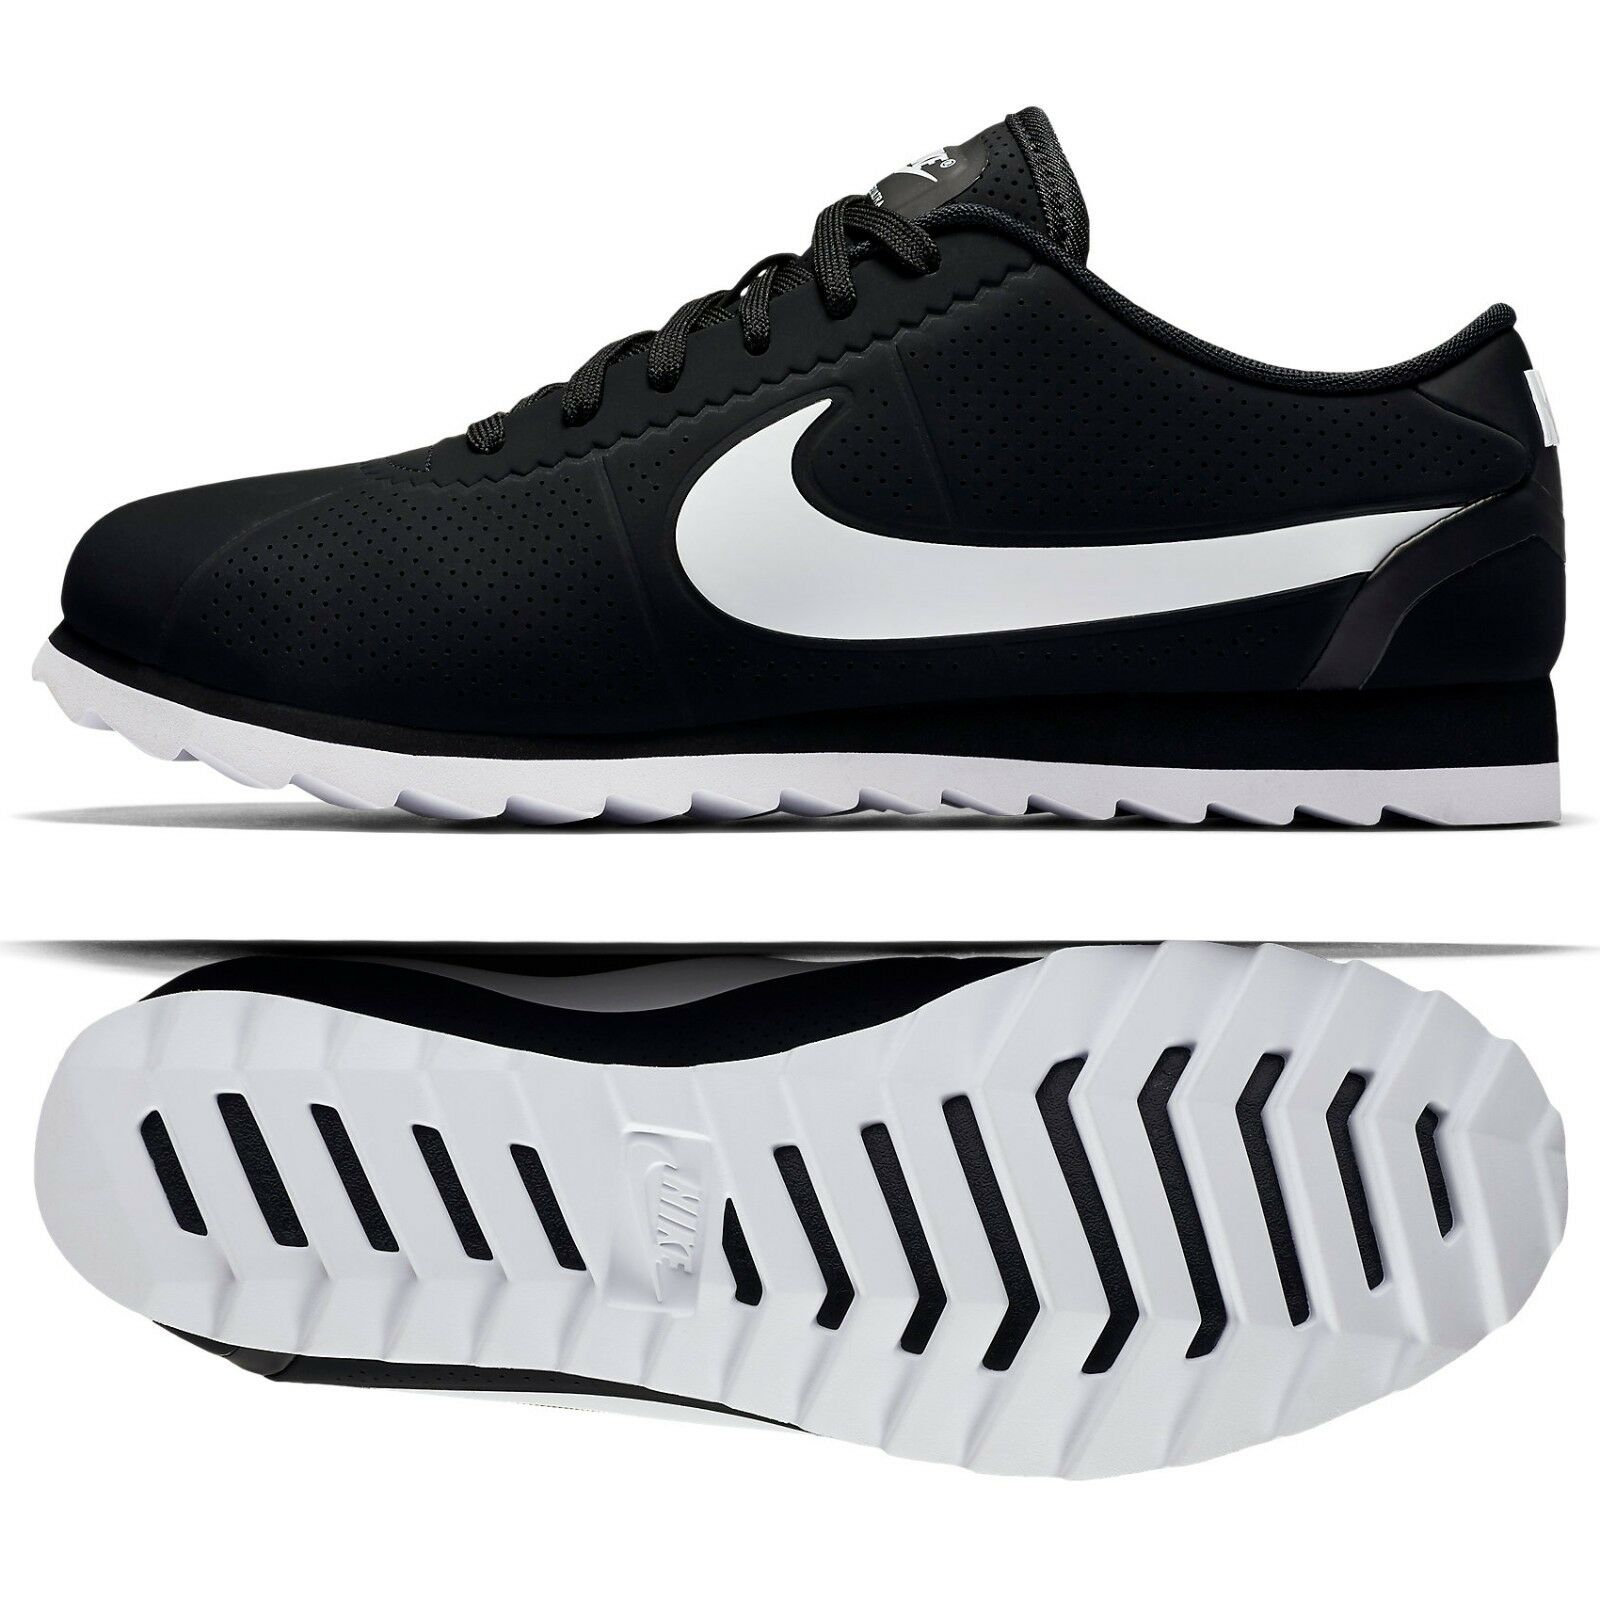 Nike W Cortez Ultra Moire 844893-001 Black/Black/White One-Piece Women's Shoes